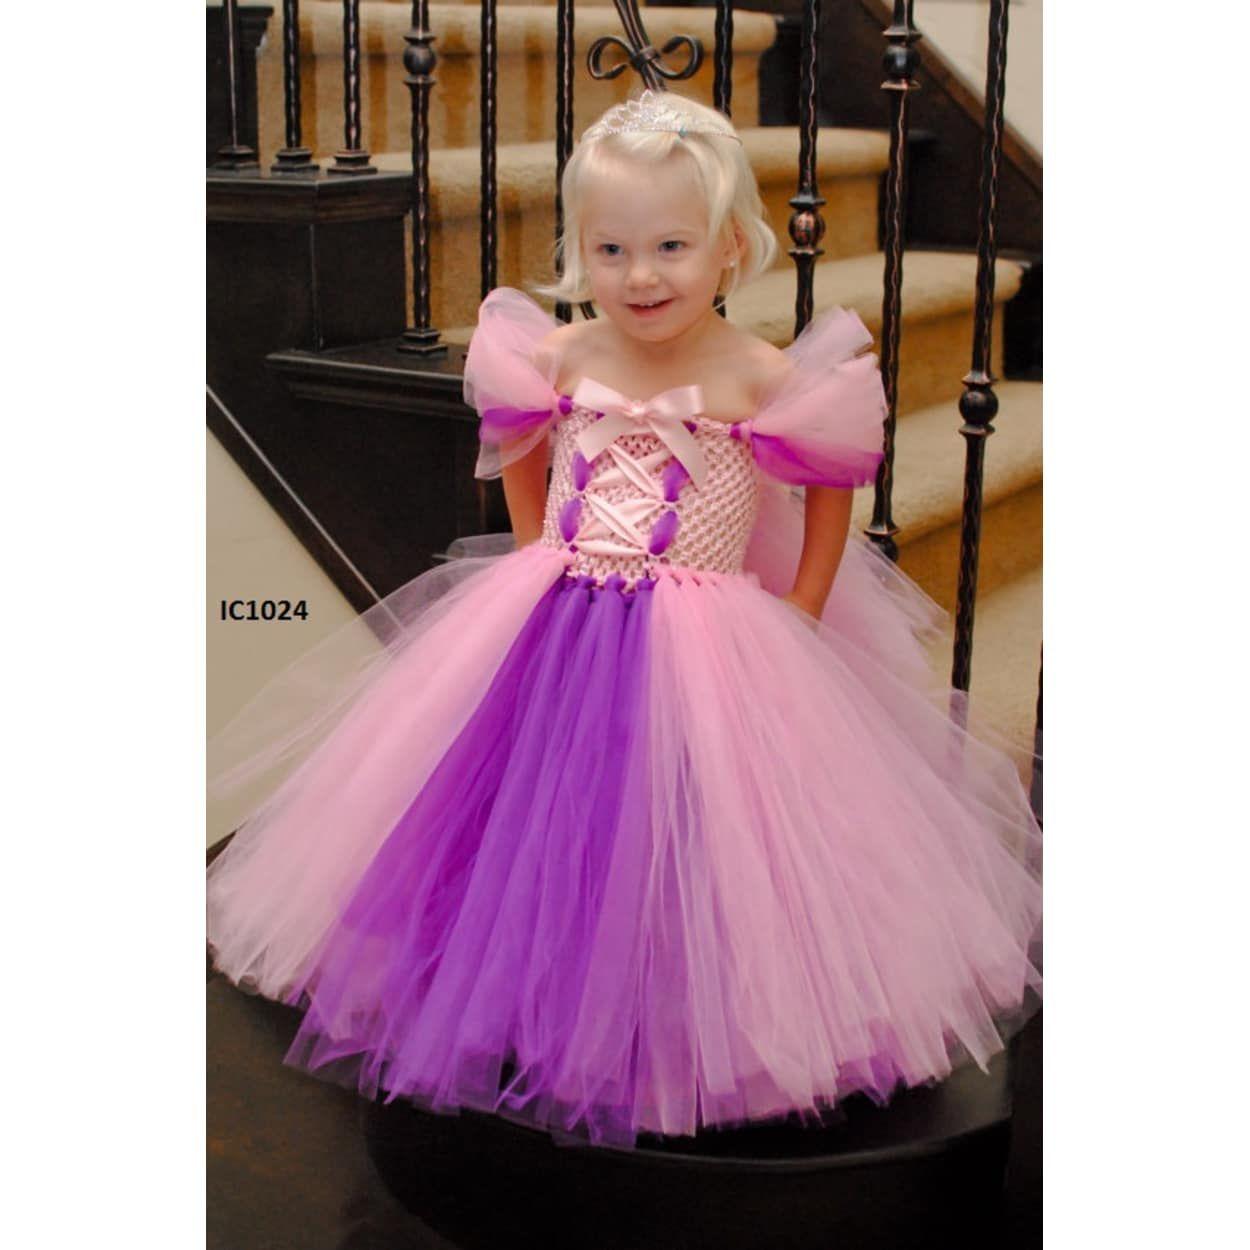 Buy Pink Purple Tutu Dresses For Girls Kids Jhakhas Buy Now The Fairy Look Tutu Dresses Onlin Girls Tutu Dresses Little Girl Dress Up Disney Princess Dresses [ 1250 x 1250 Pixel ]